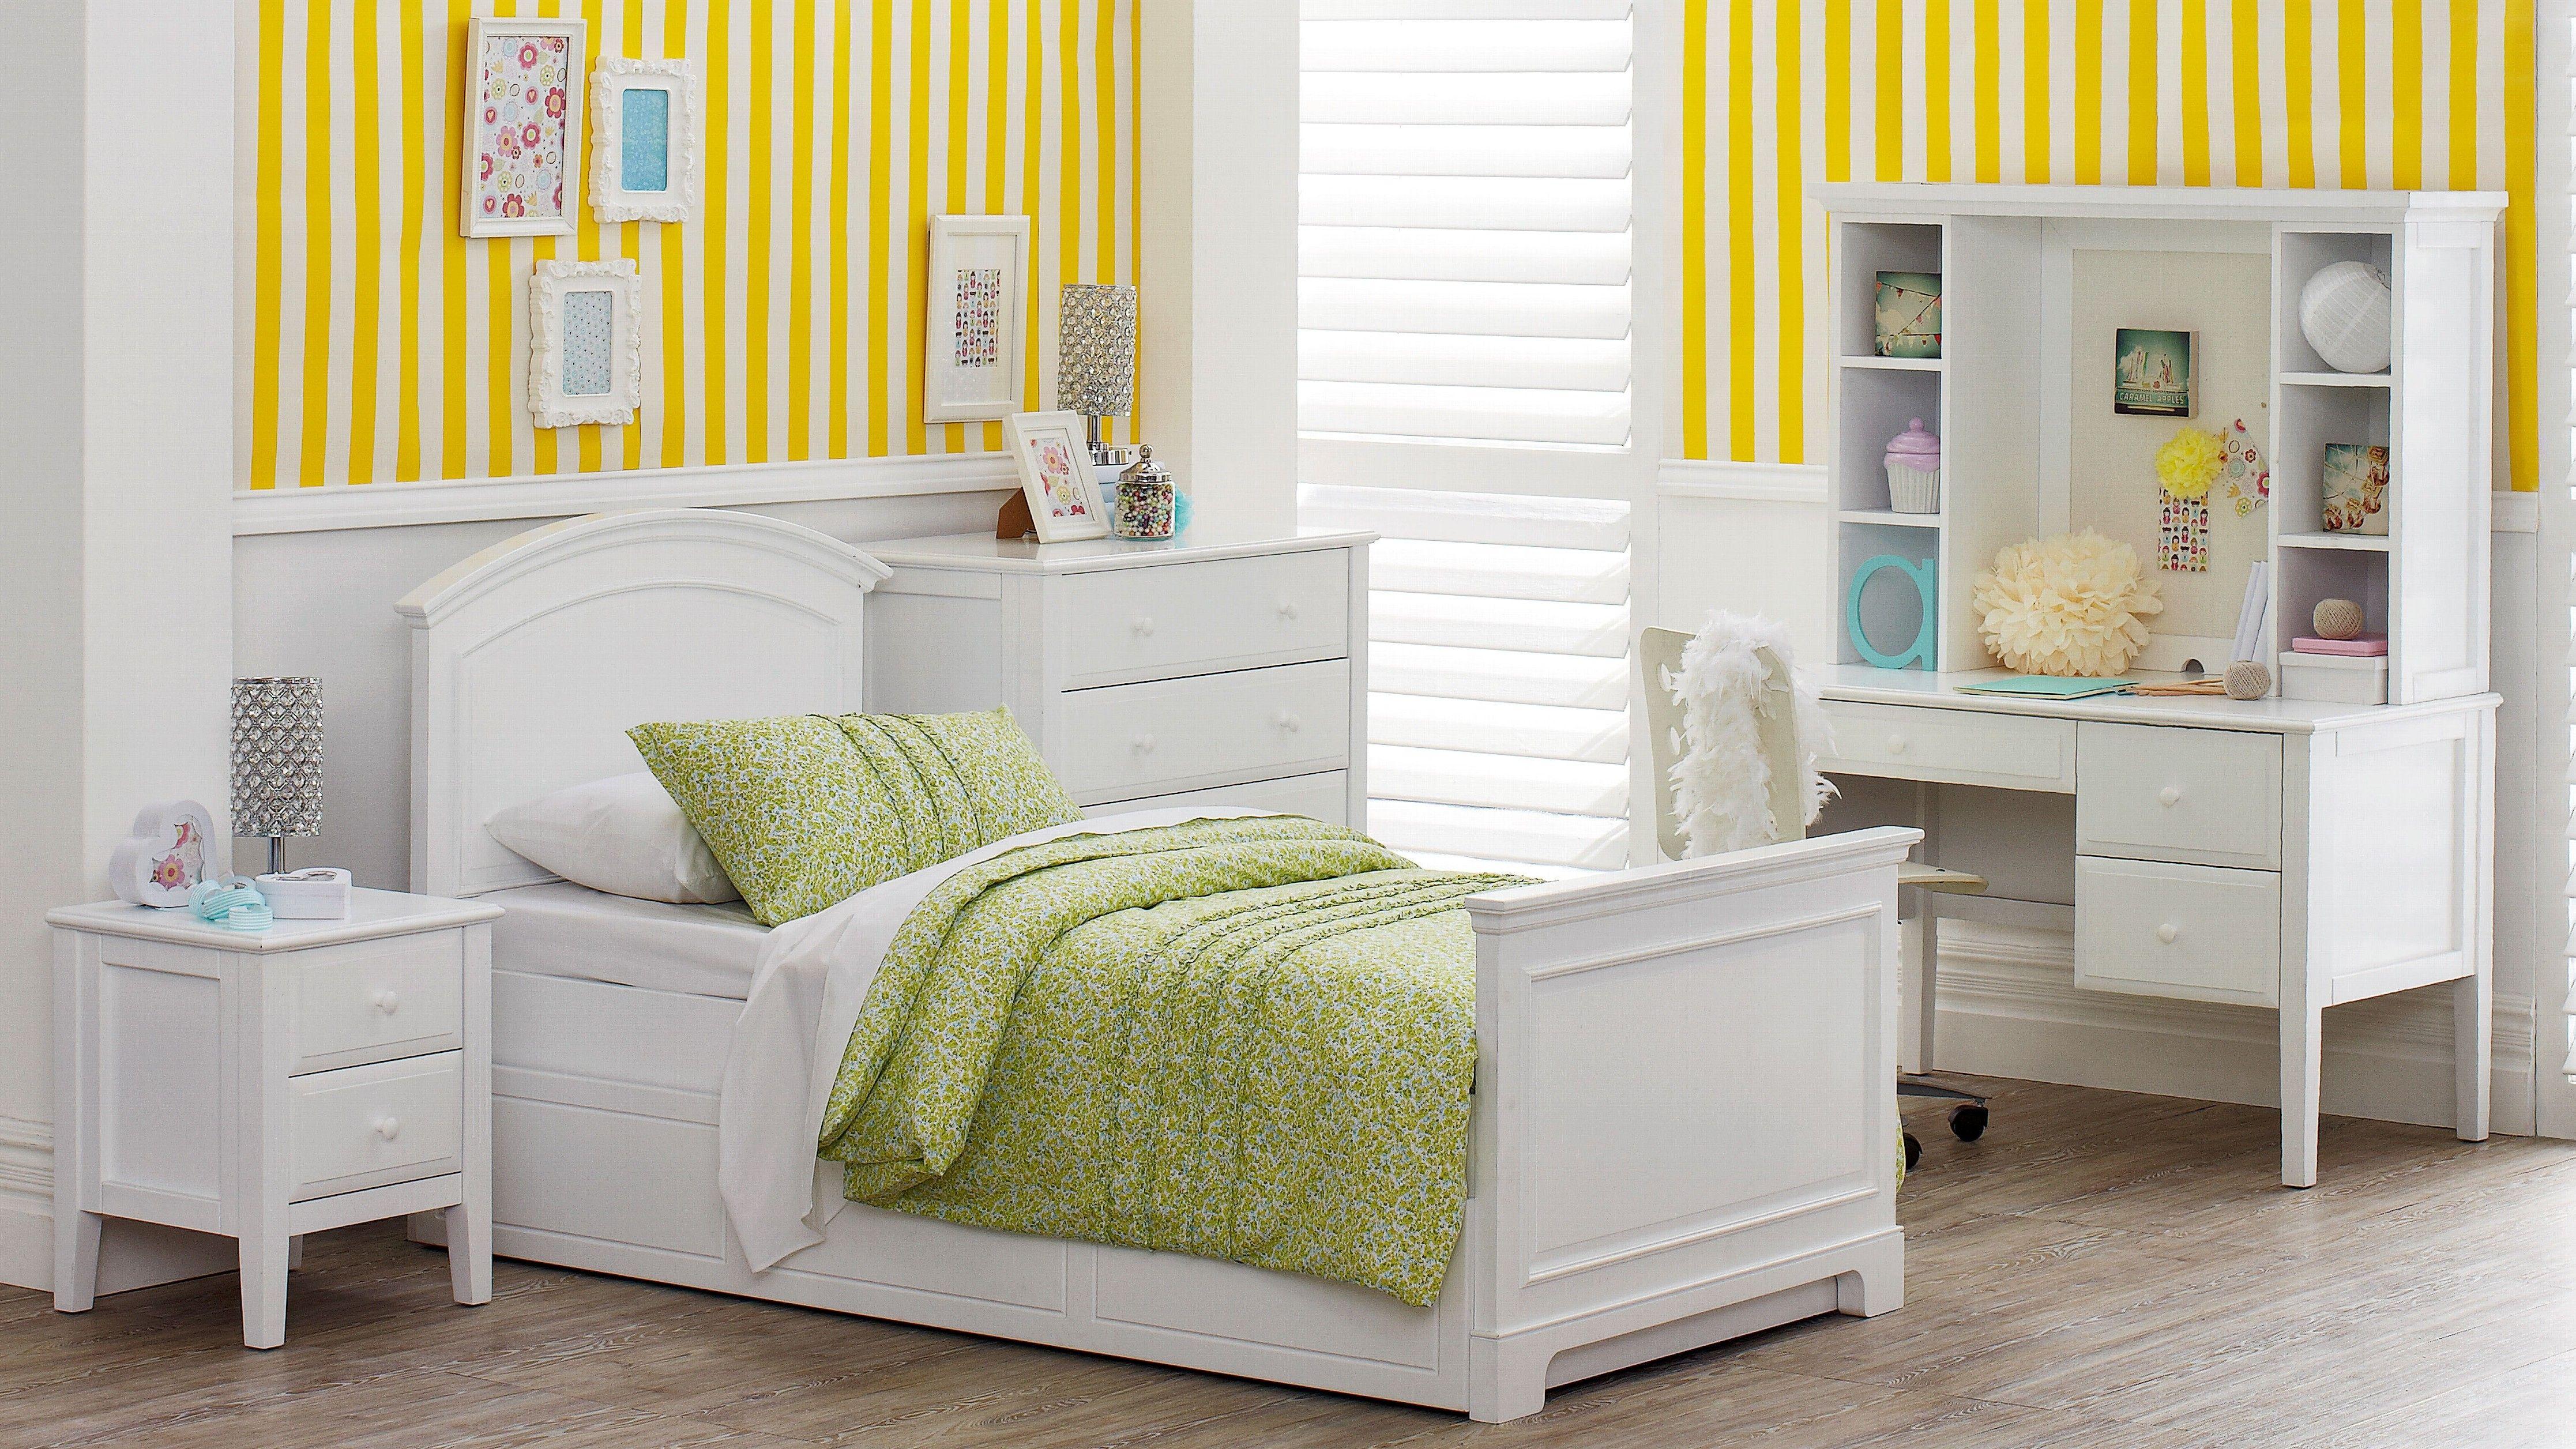 Sienna Single Bed | Big girl room | Pinterest | Single bedroom ...